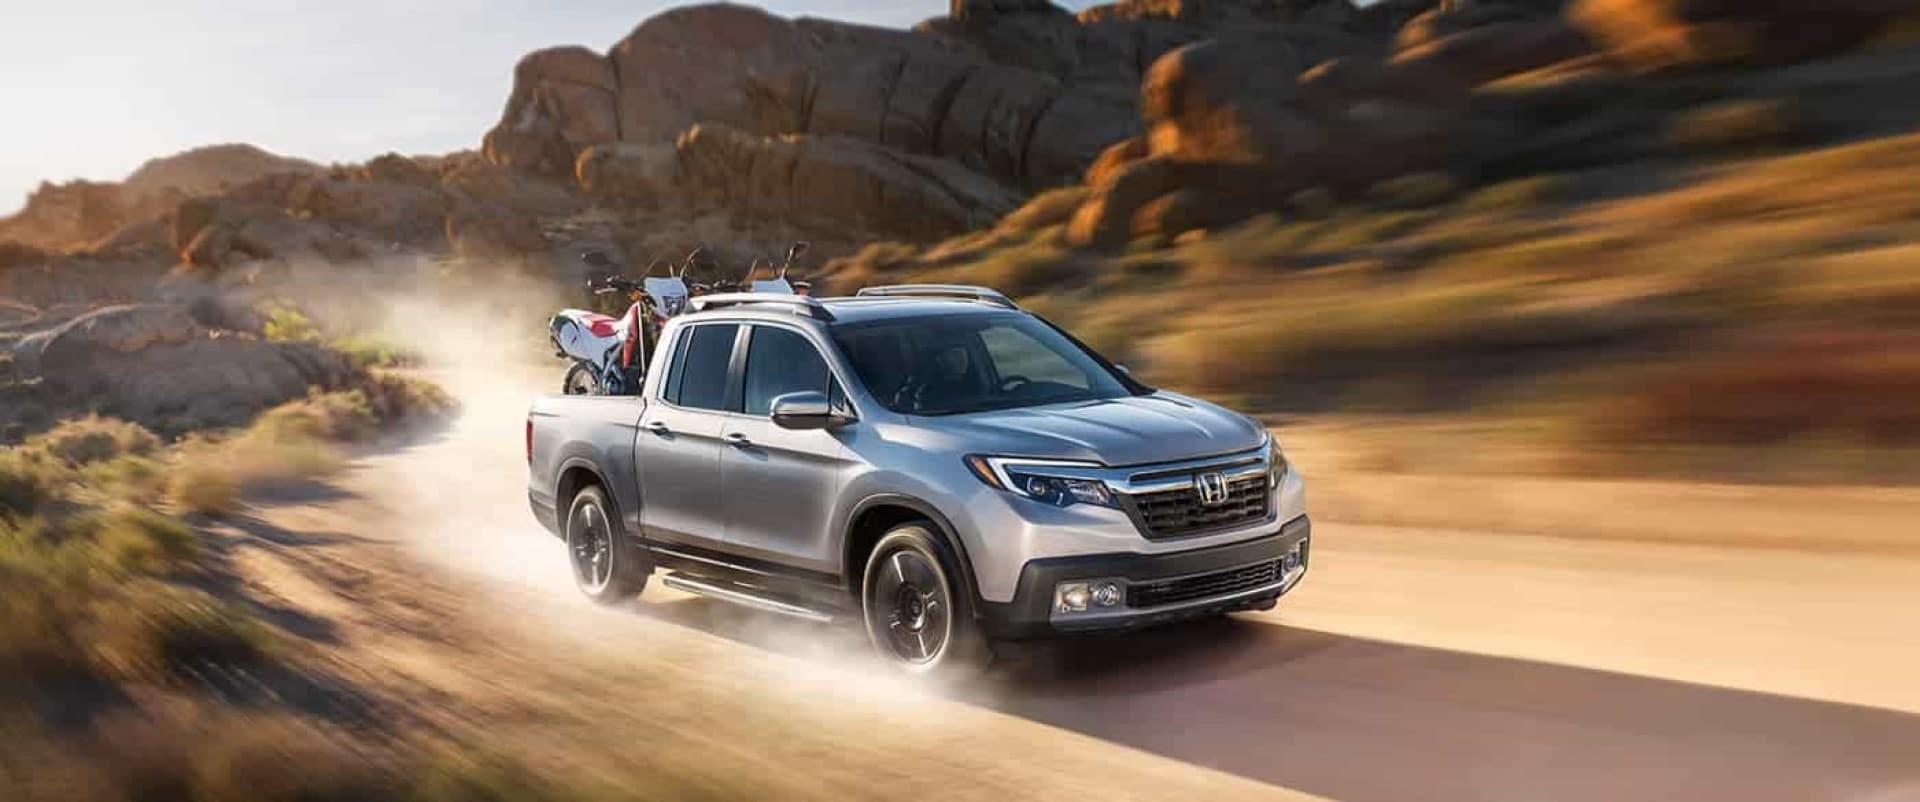 Honda_Ridgeline_Driving_On_Dirt_Road